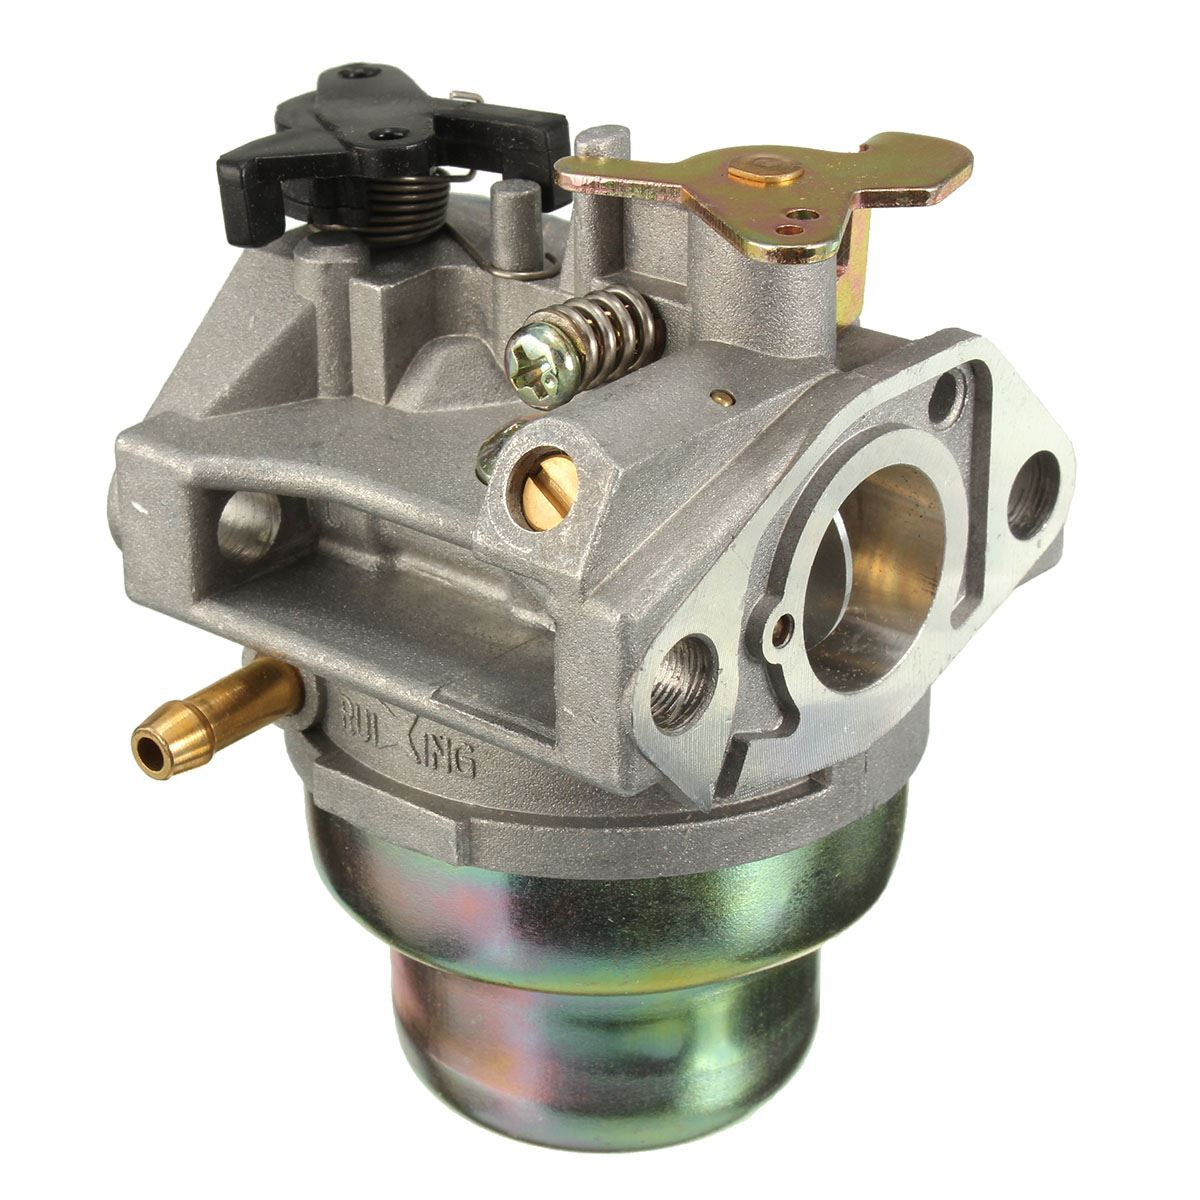 honda engine gcv160 carburetor diagram 7 prinzessinnen und jede menge drachen adjustable carb for hrb216 hrs216